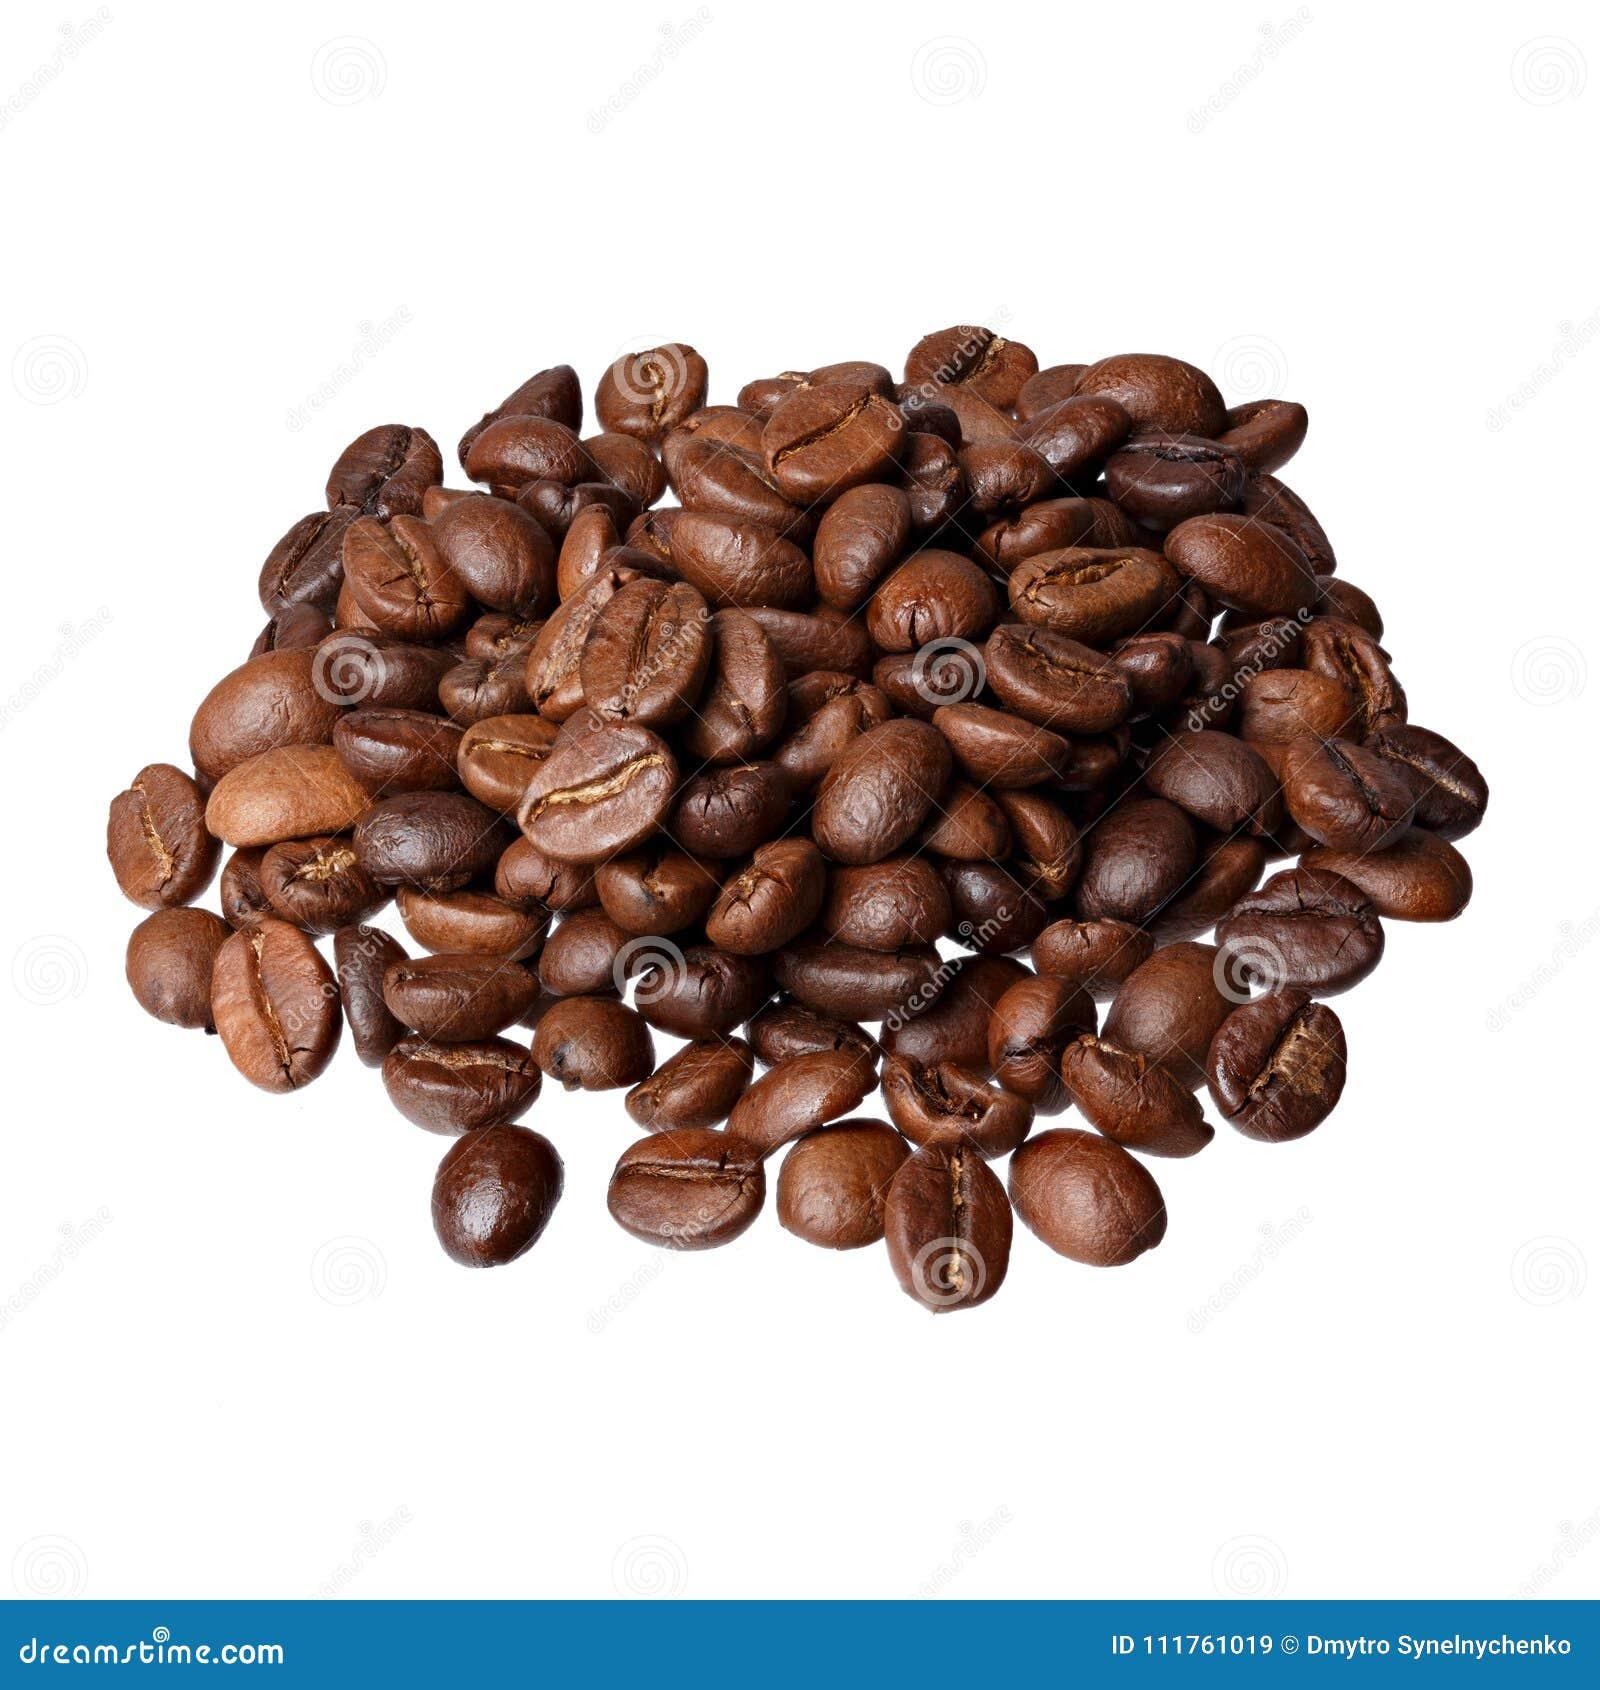 Caramel Latte Gourmet Coffee On White Background Stock: Espresso 800 Gourmet Coffee On White Background. Espresso